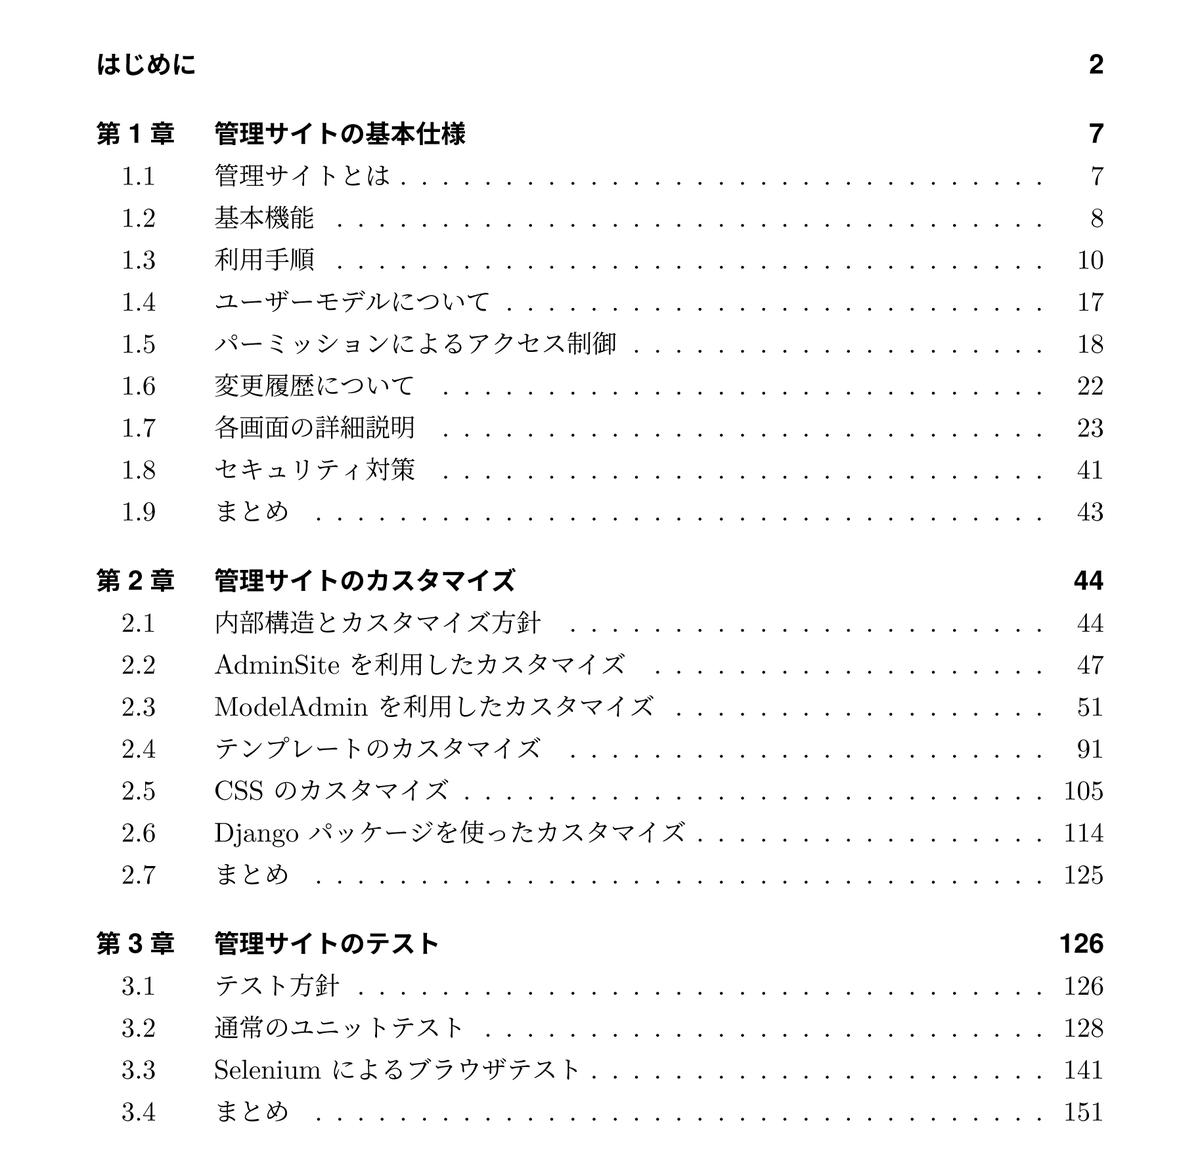 f:id:akiyoko:20200824093755p:plain:w500